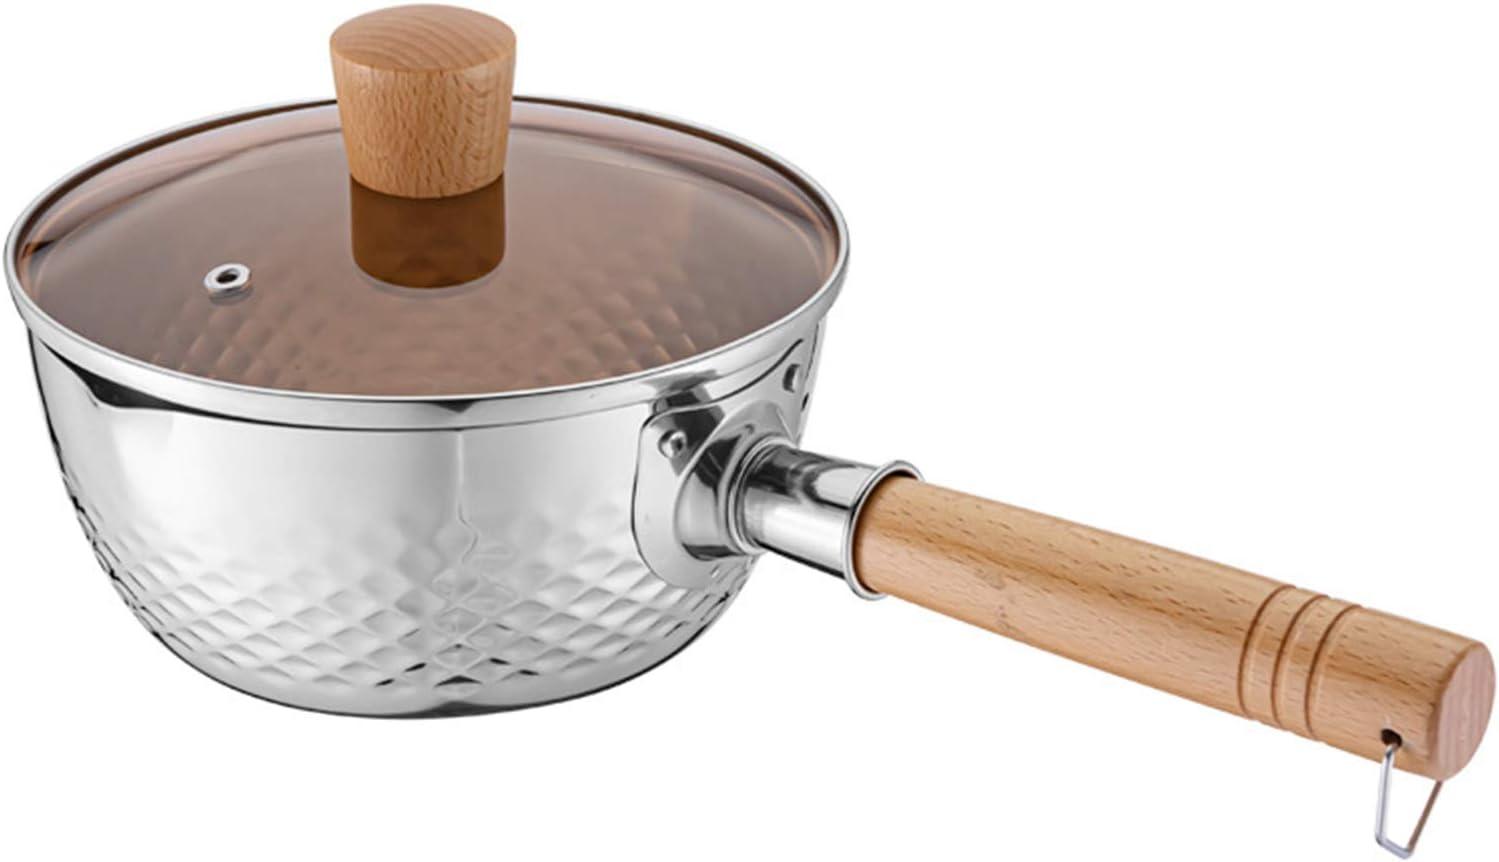 Stainless Steel Saucepan Milk Sauce Pan with Glass Lid and Oil Drip Rack,Deep Type Yukihira Saucepan,2.2 Quart (20cm / 7.8inch / 2.2 Quart)